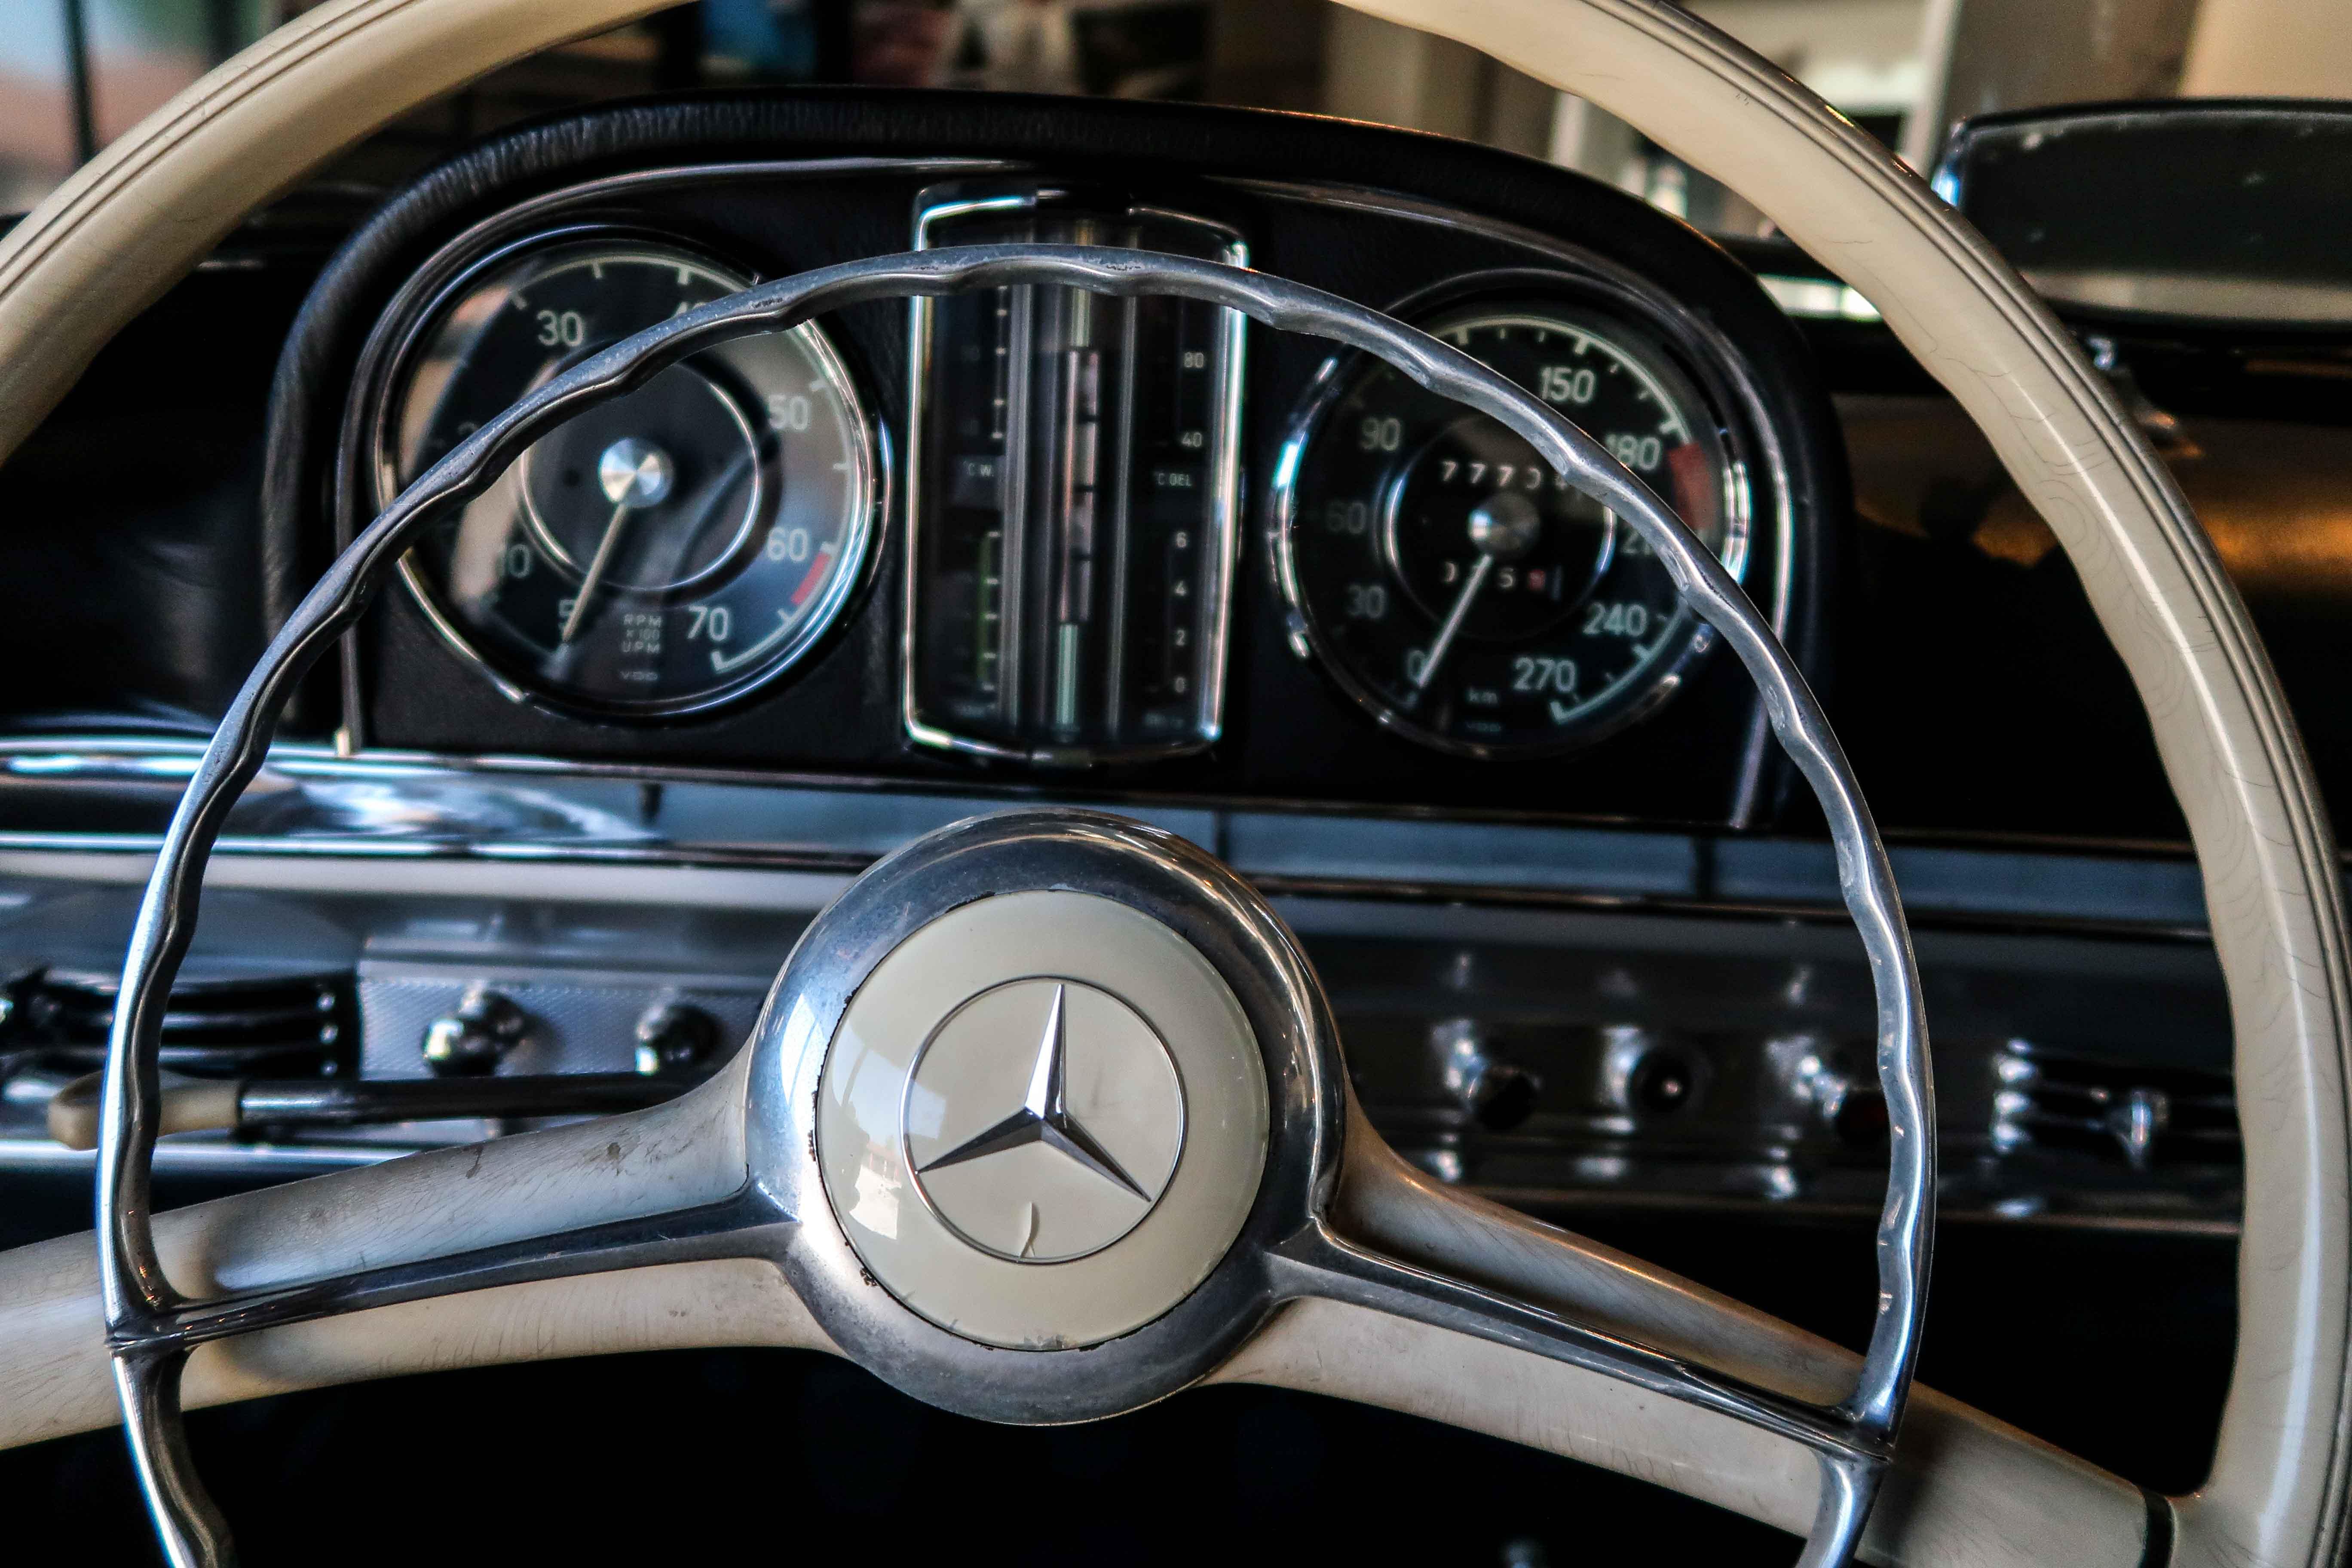 12-1957-1963-Mercedes-Benz-300-SL-Roadster.jpg